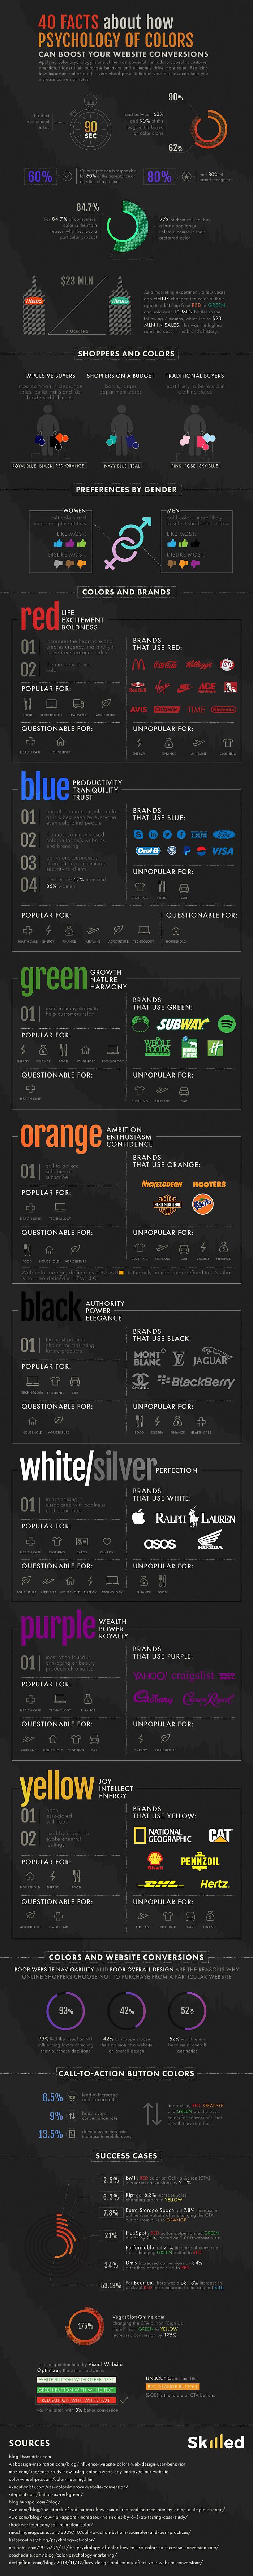 farben-infografik-internetblogger-de